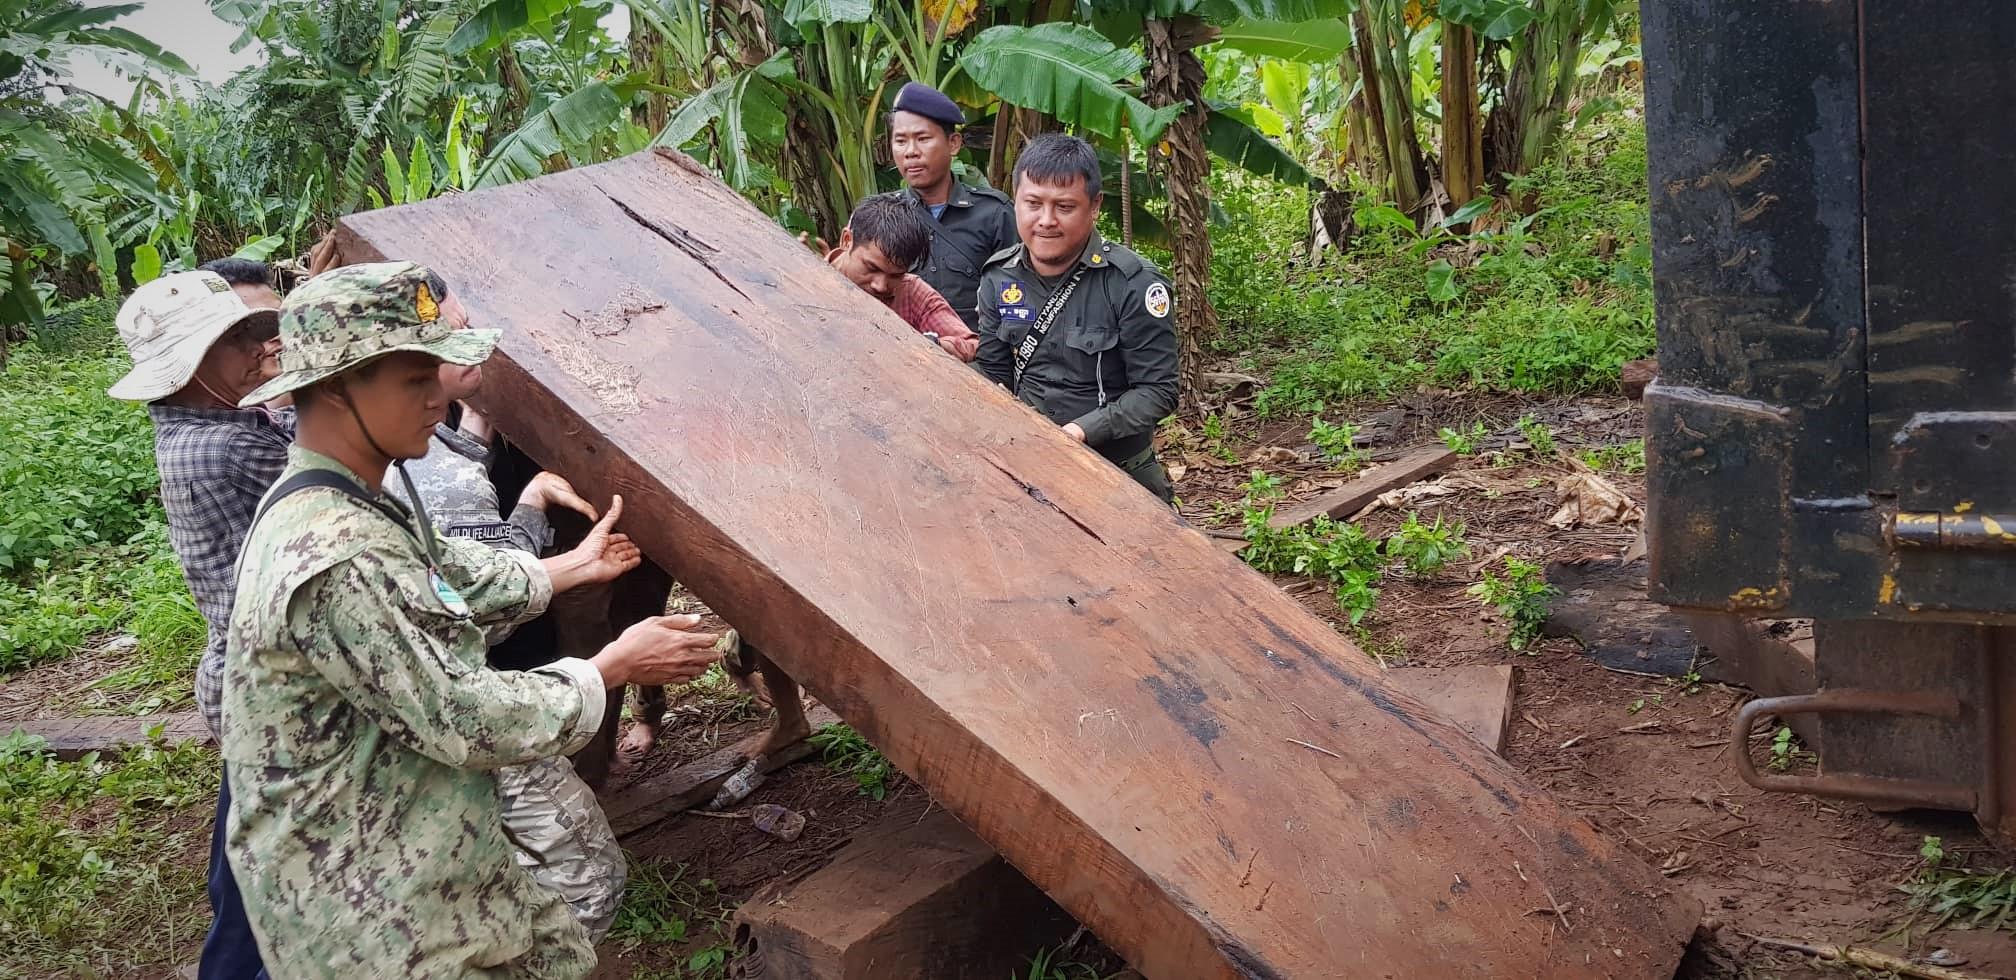 Endangered tree species timber